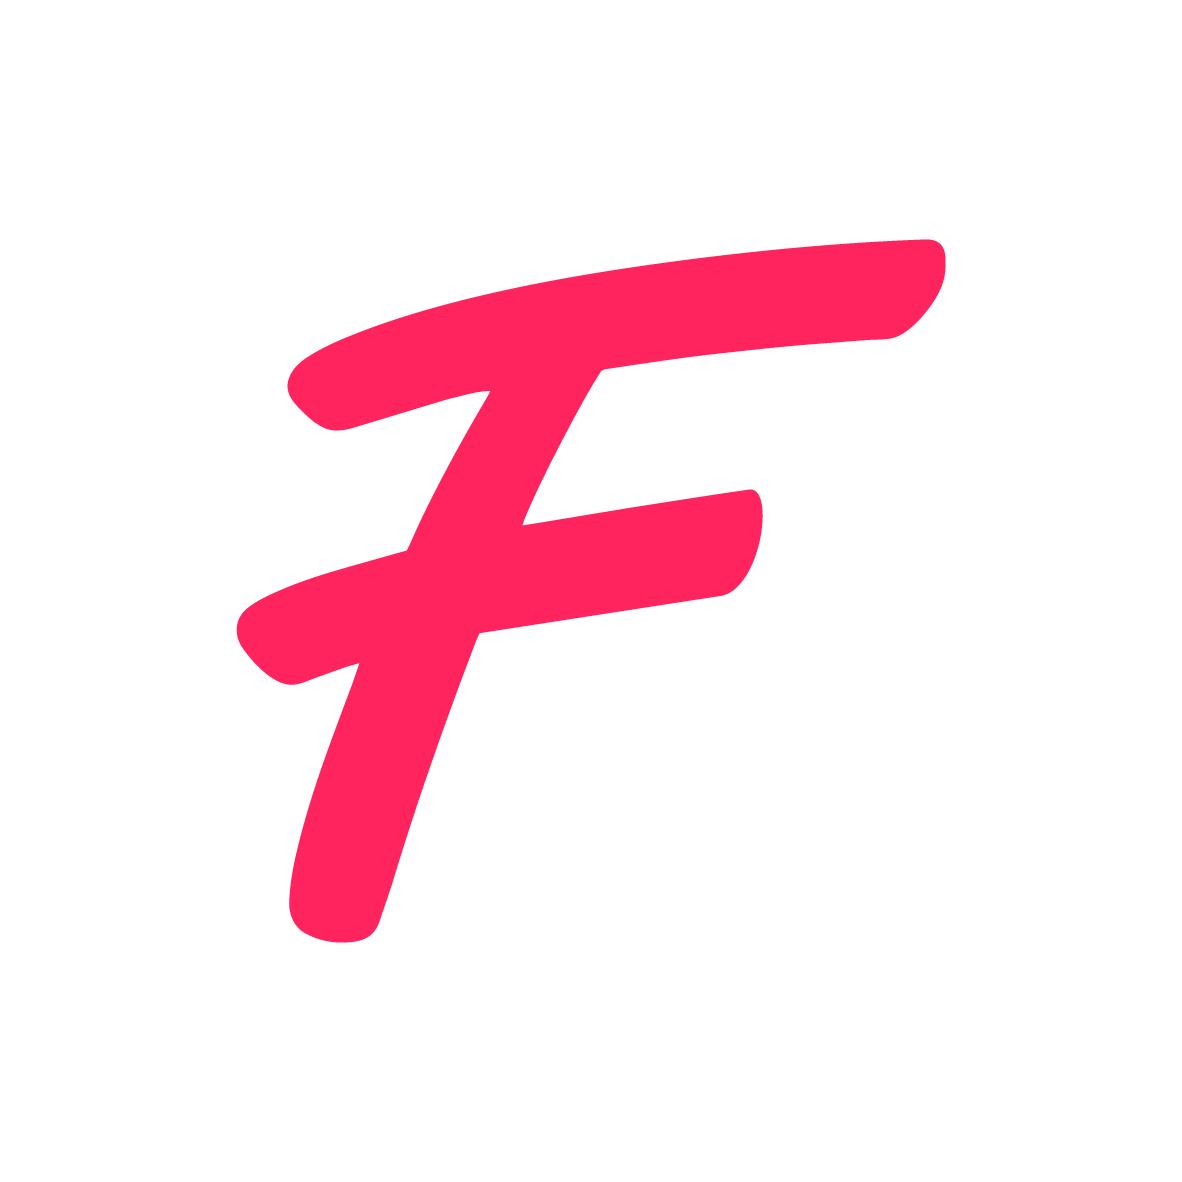 F flexy cmjn